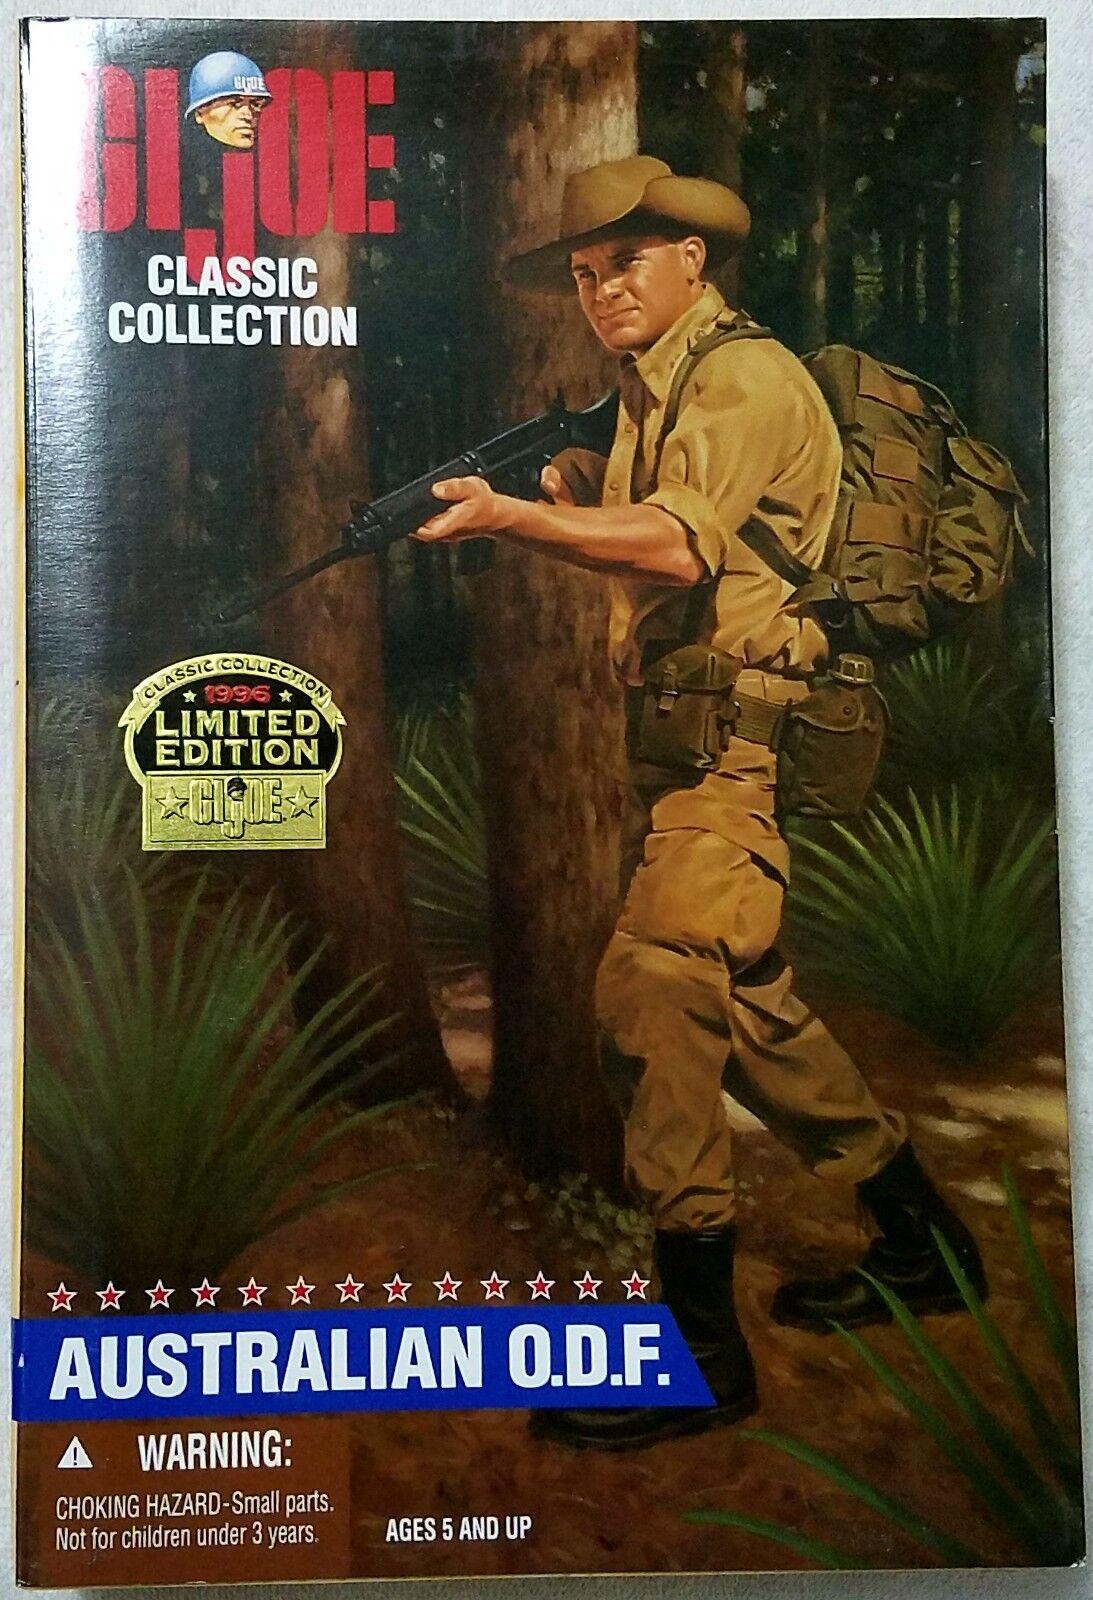 GI JOE Classic Collection Limited Edition Australian O.D.F. MIMP MIMB MIP MIB